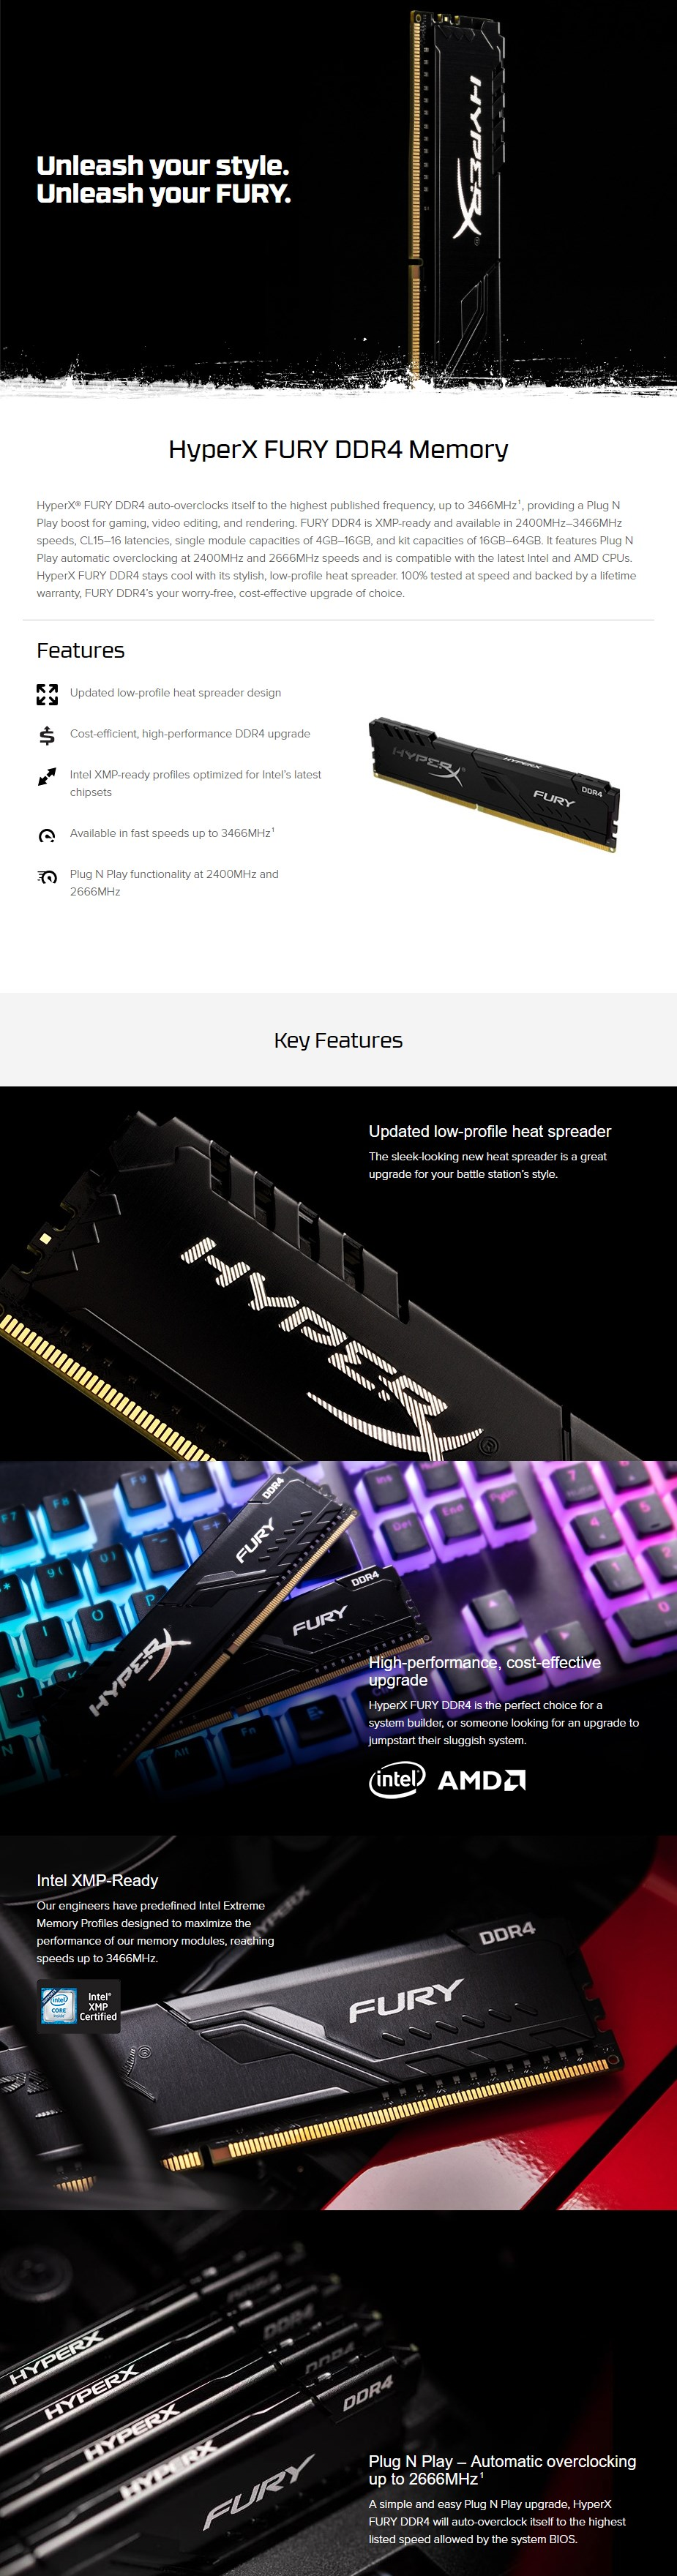 Kingston HyperX FURY 16GB (2x 8GB) DDR4 2666MHz Memory Black - Overview 1